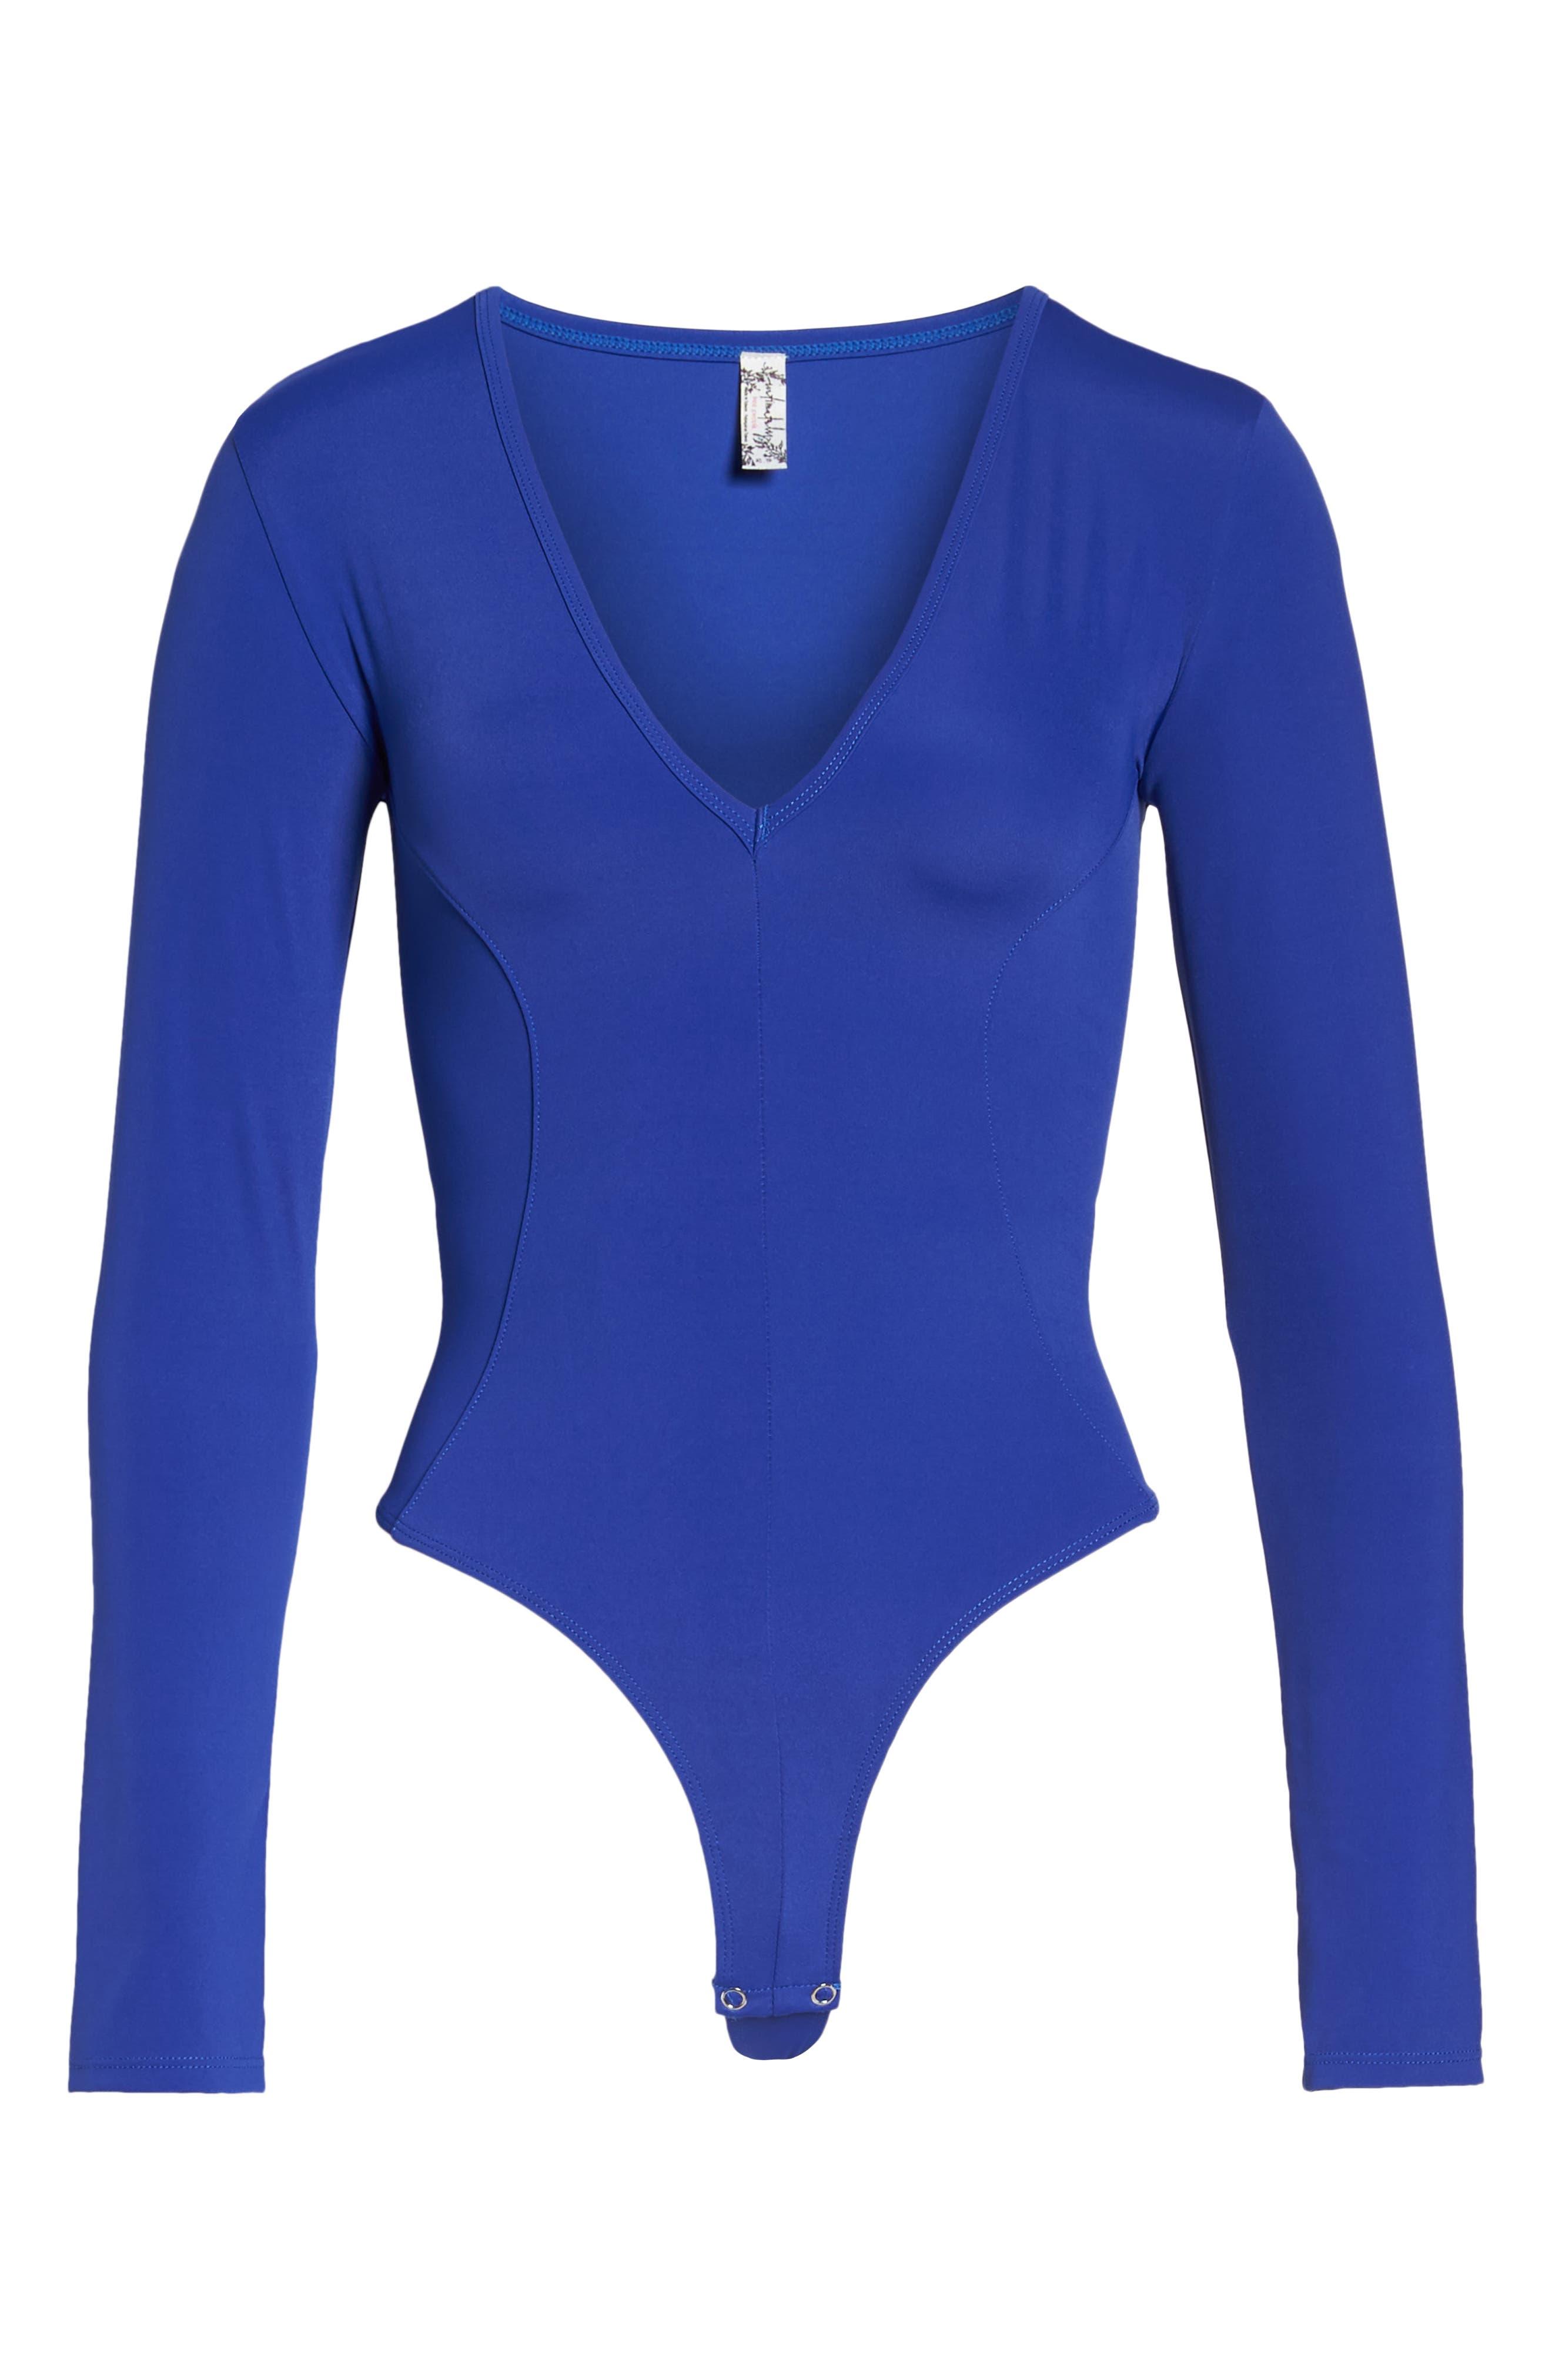 Intimately FP Thong Bodysuit,                             Alternate thumbnail 6, color,                             BLUE